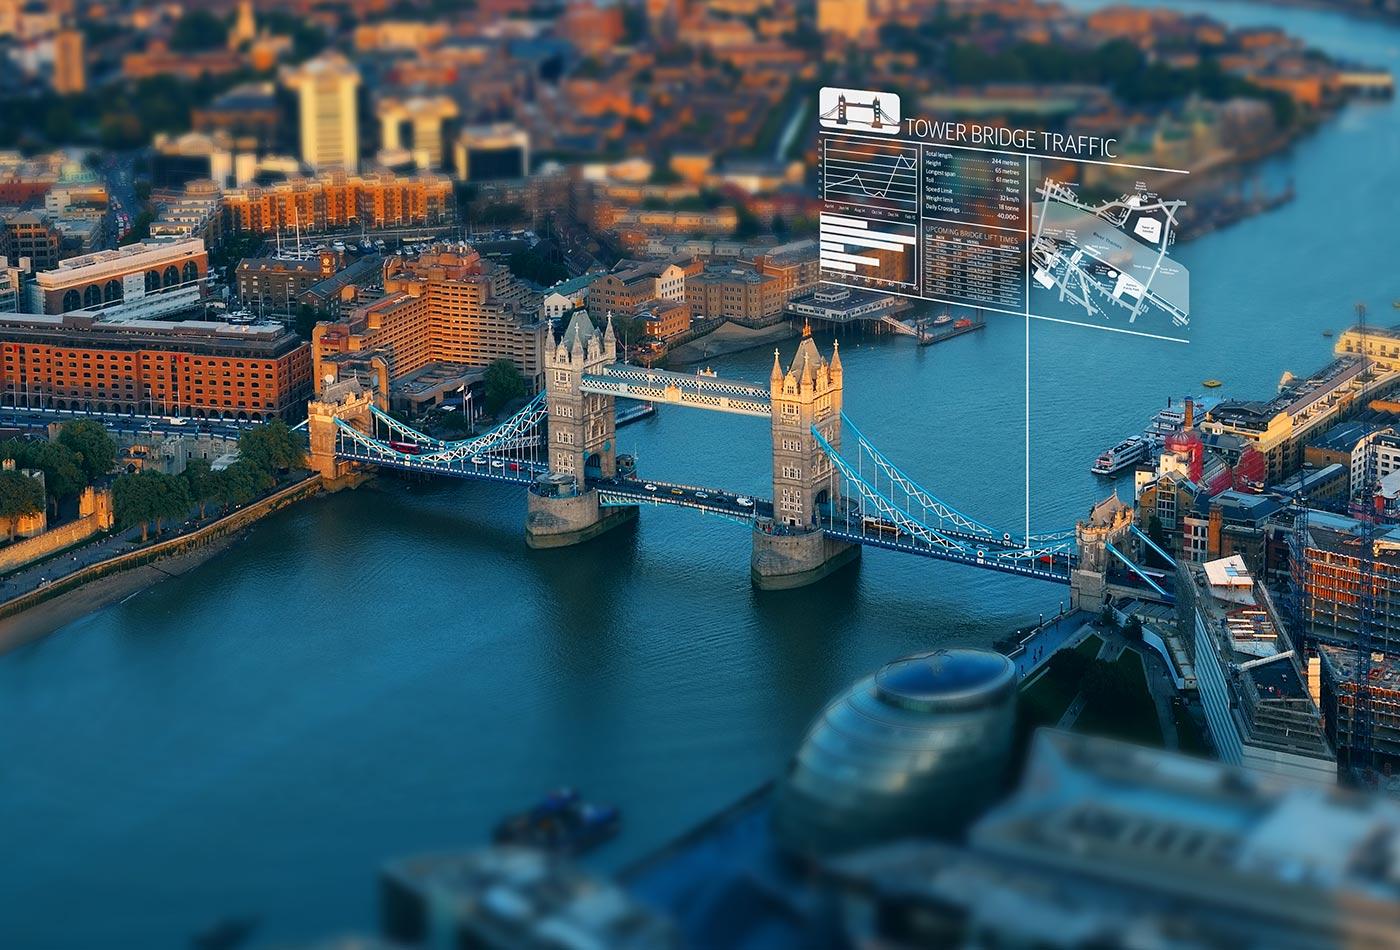 Tower Bridge traffic.